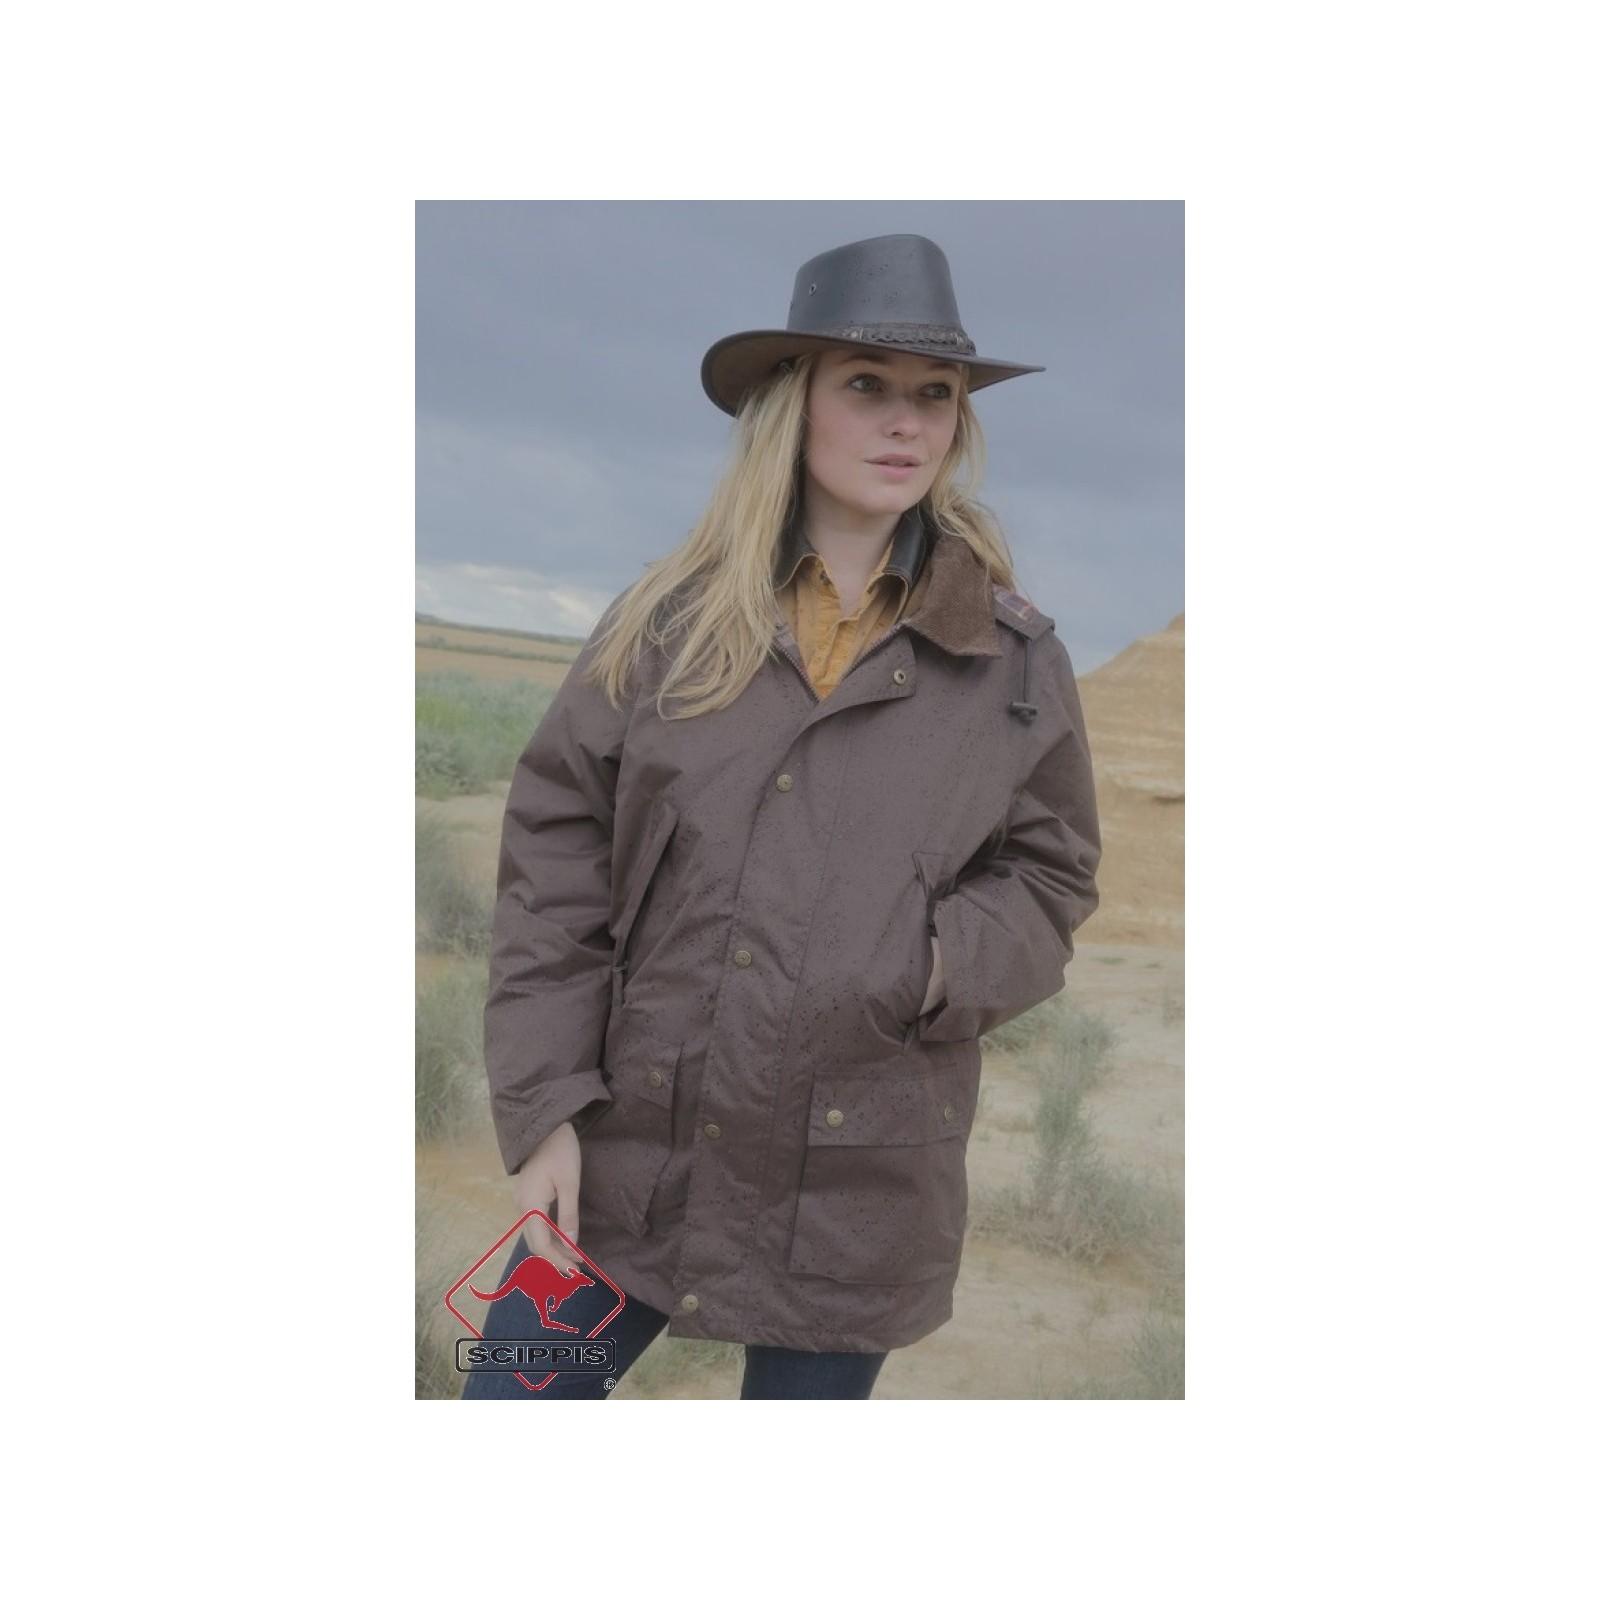 Scippis Kimberley Jacket (Rain Wear)